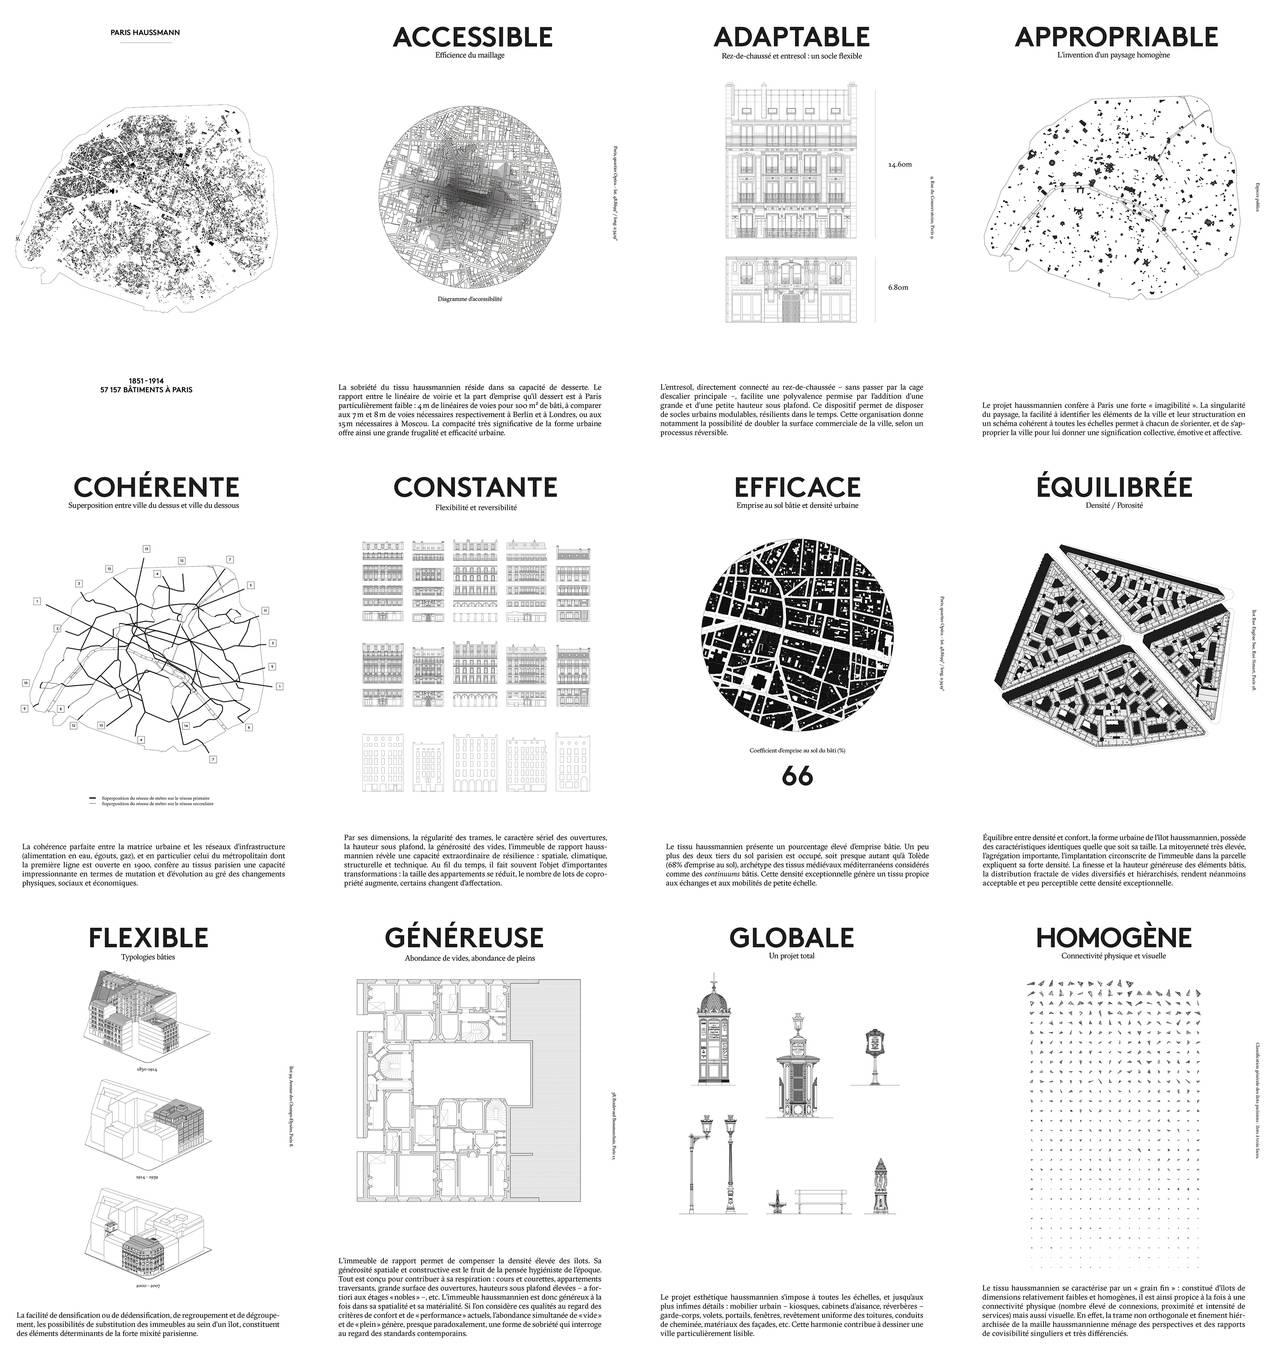 Paris Haussmann : A Model's Relevance